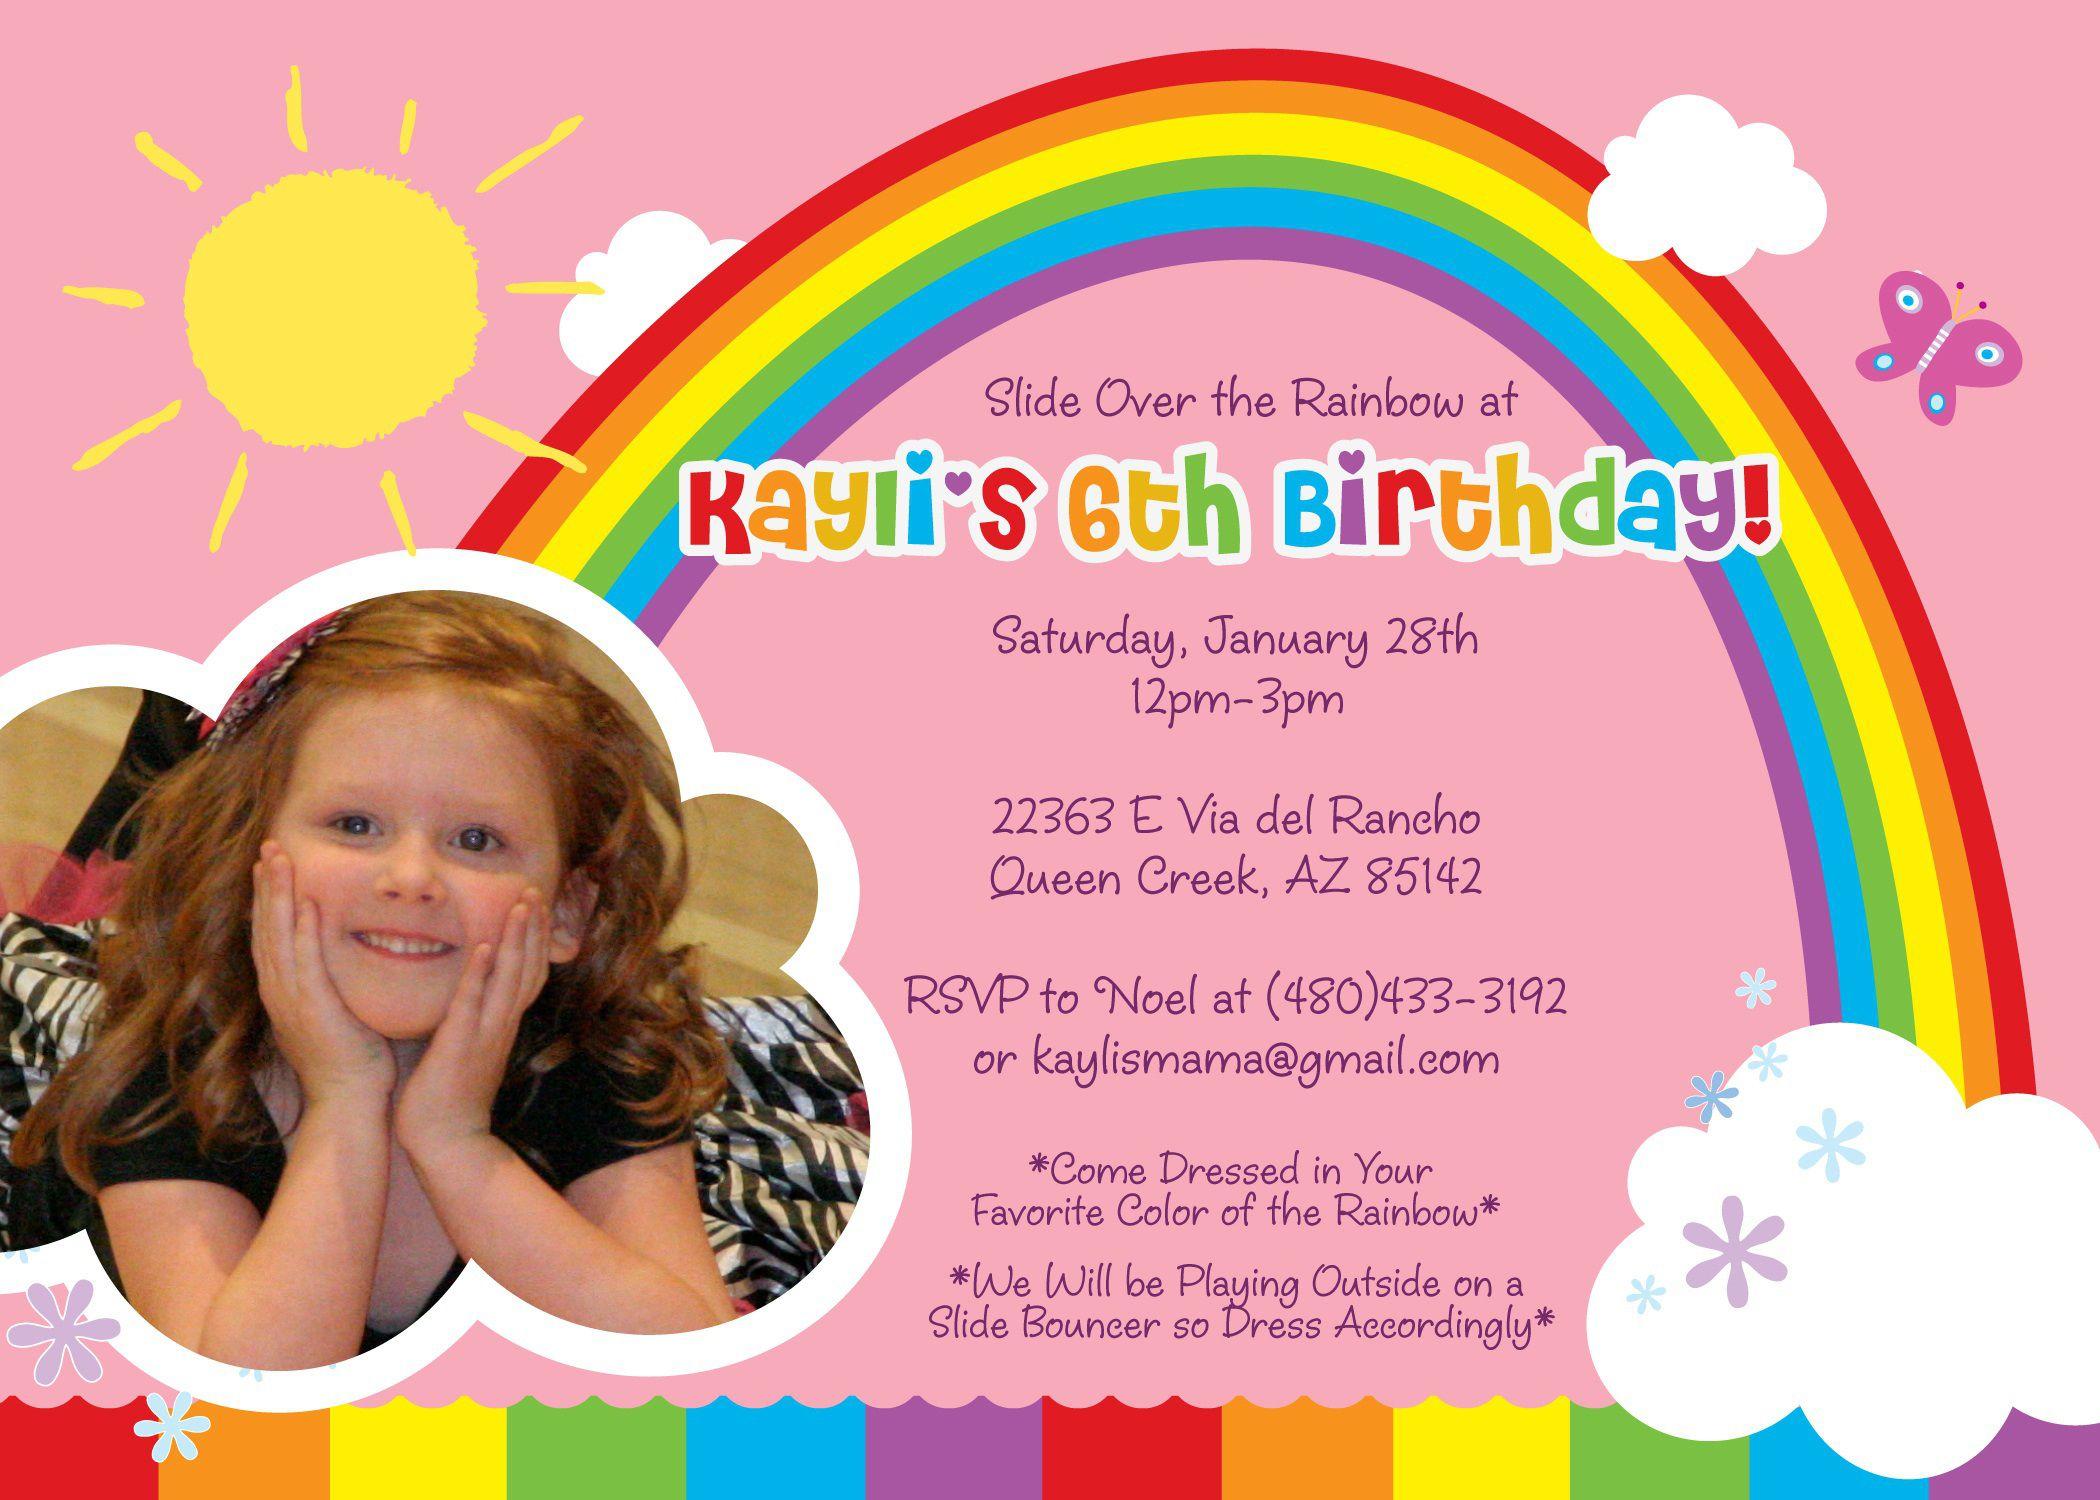 009 Striking Birthday Party Invitation Template Word Photo  40th Wording Sample Unicorn FreeFull